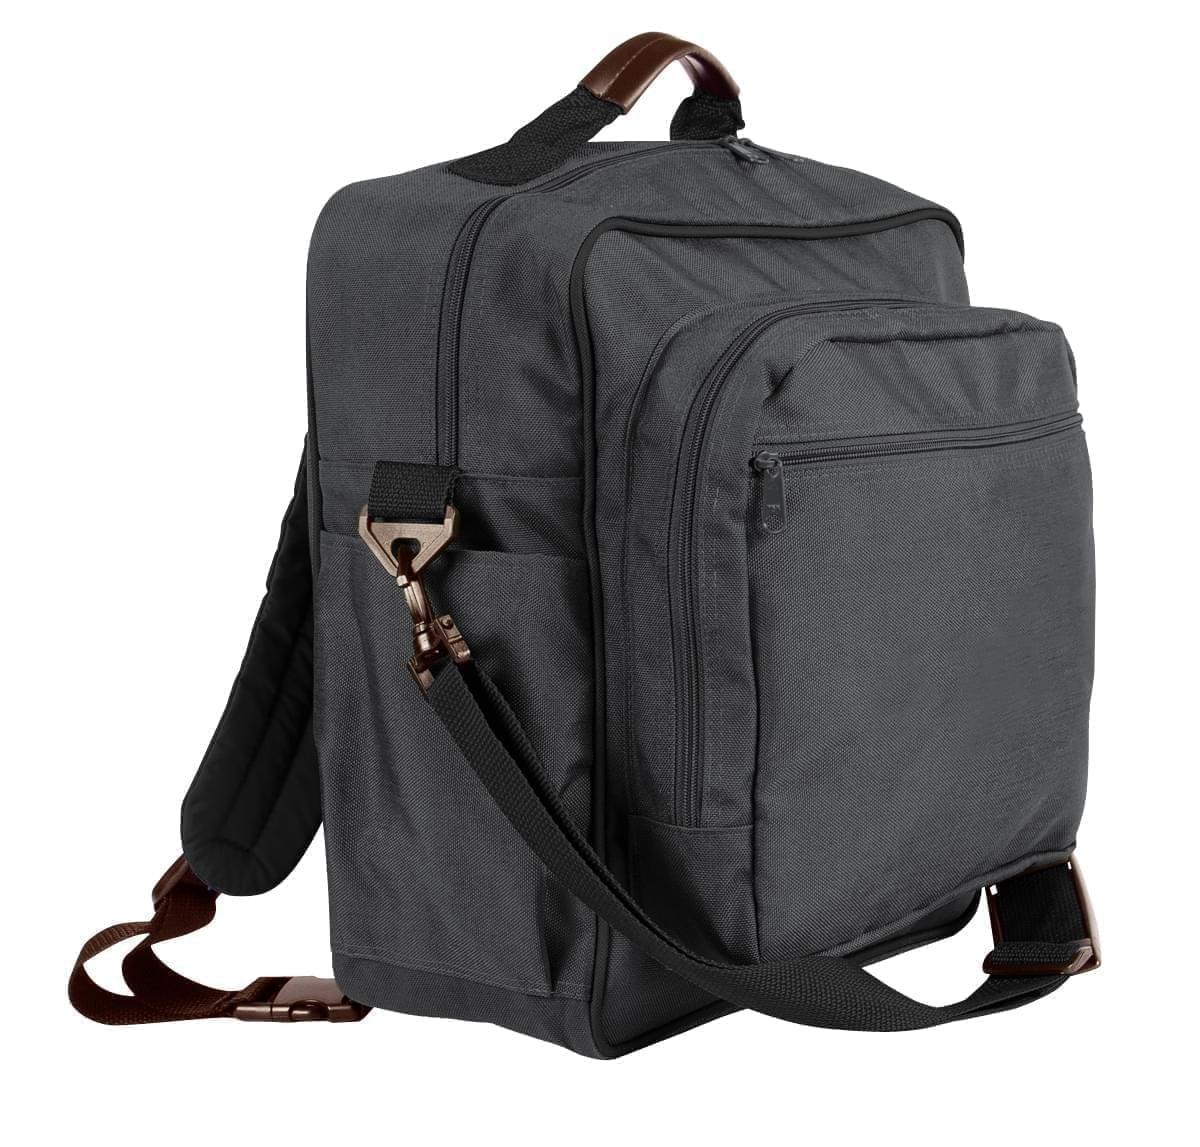 USA Made Poly Daypack Rucksacks, 1070-600